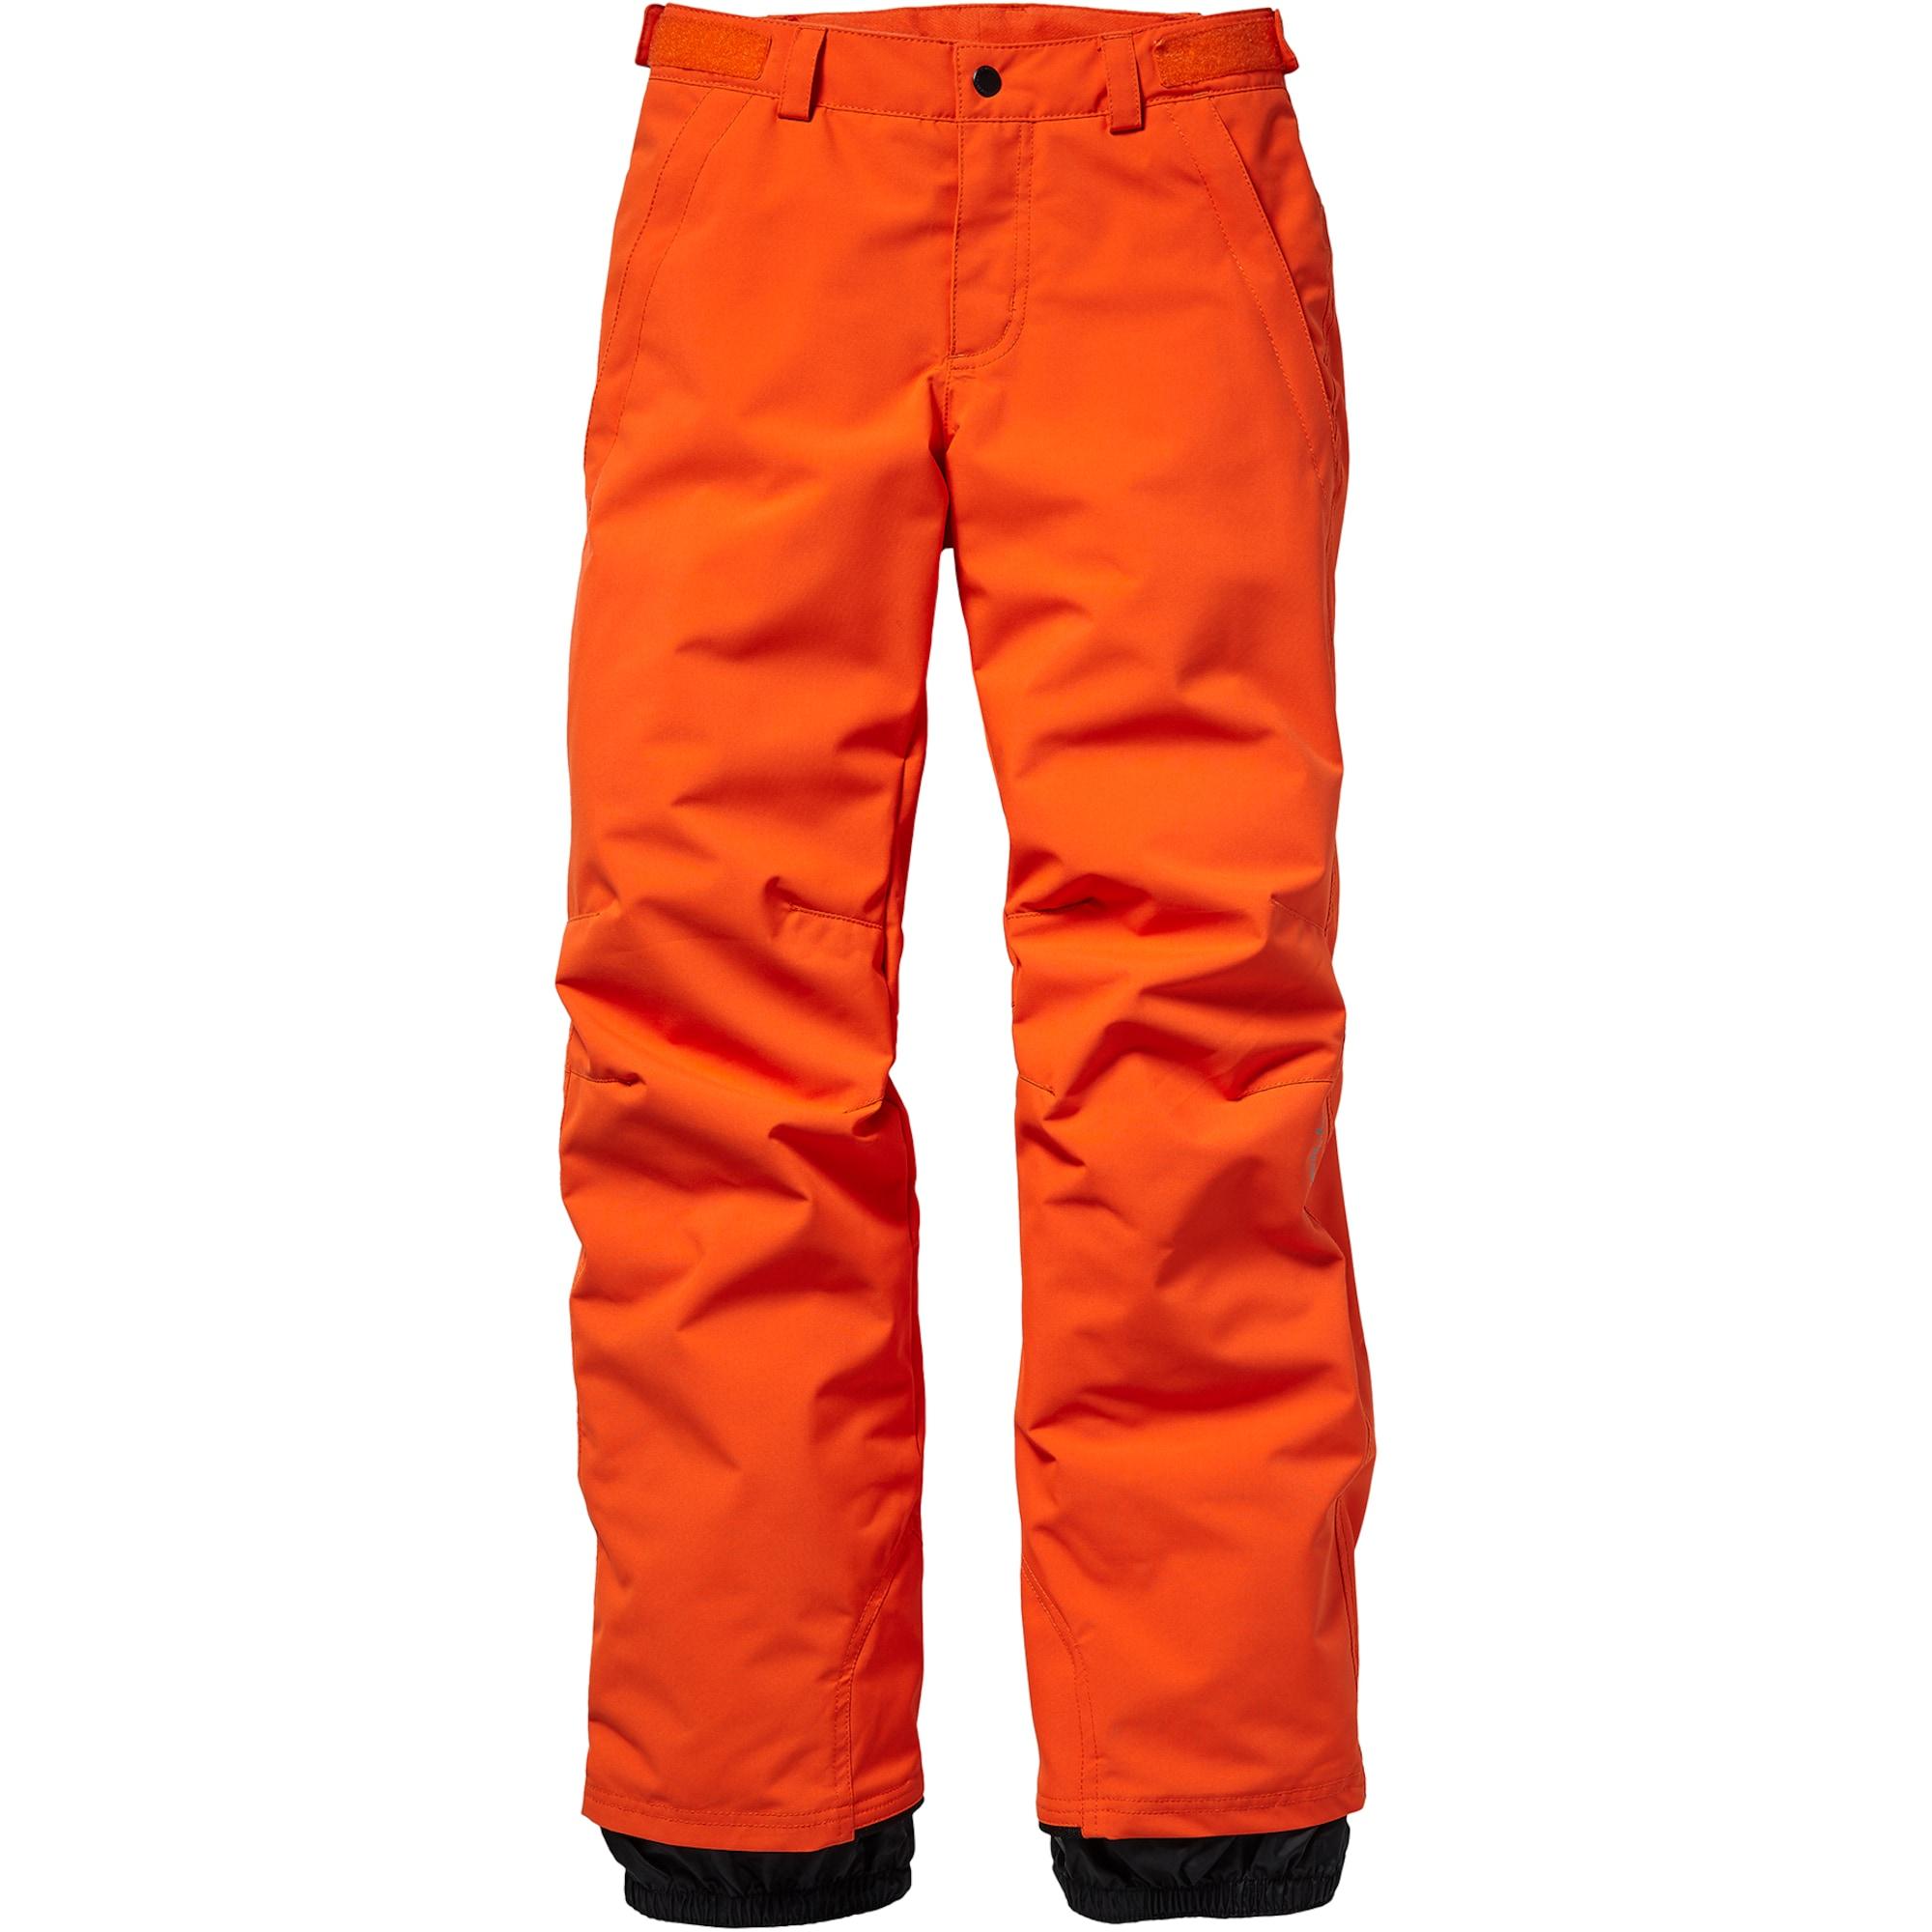 ONEILL Outodoor kalhoty PB ANVIL PANTS oranžová O'NEILL